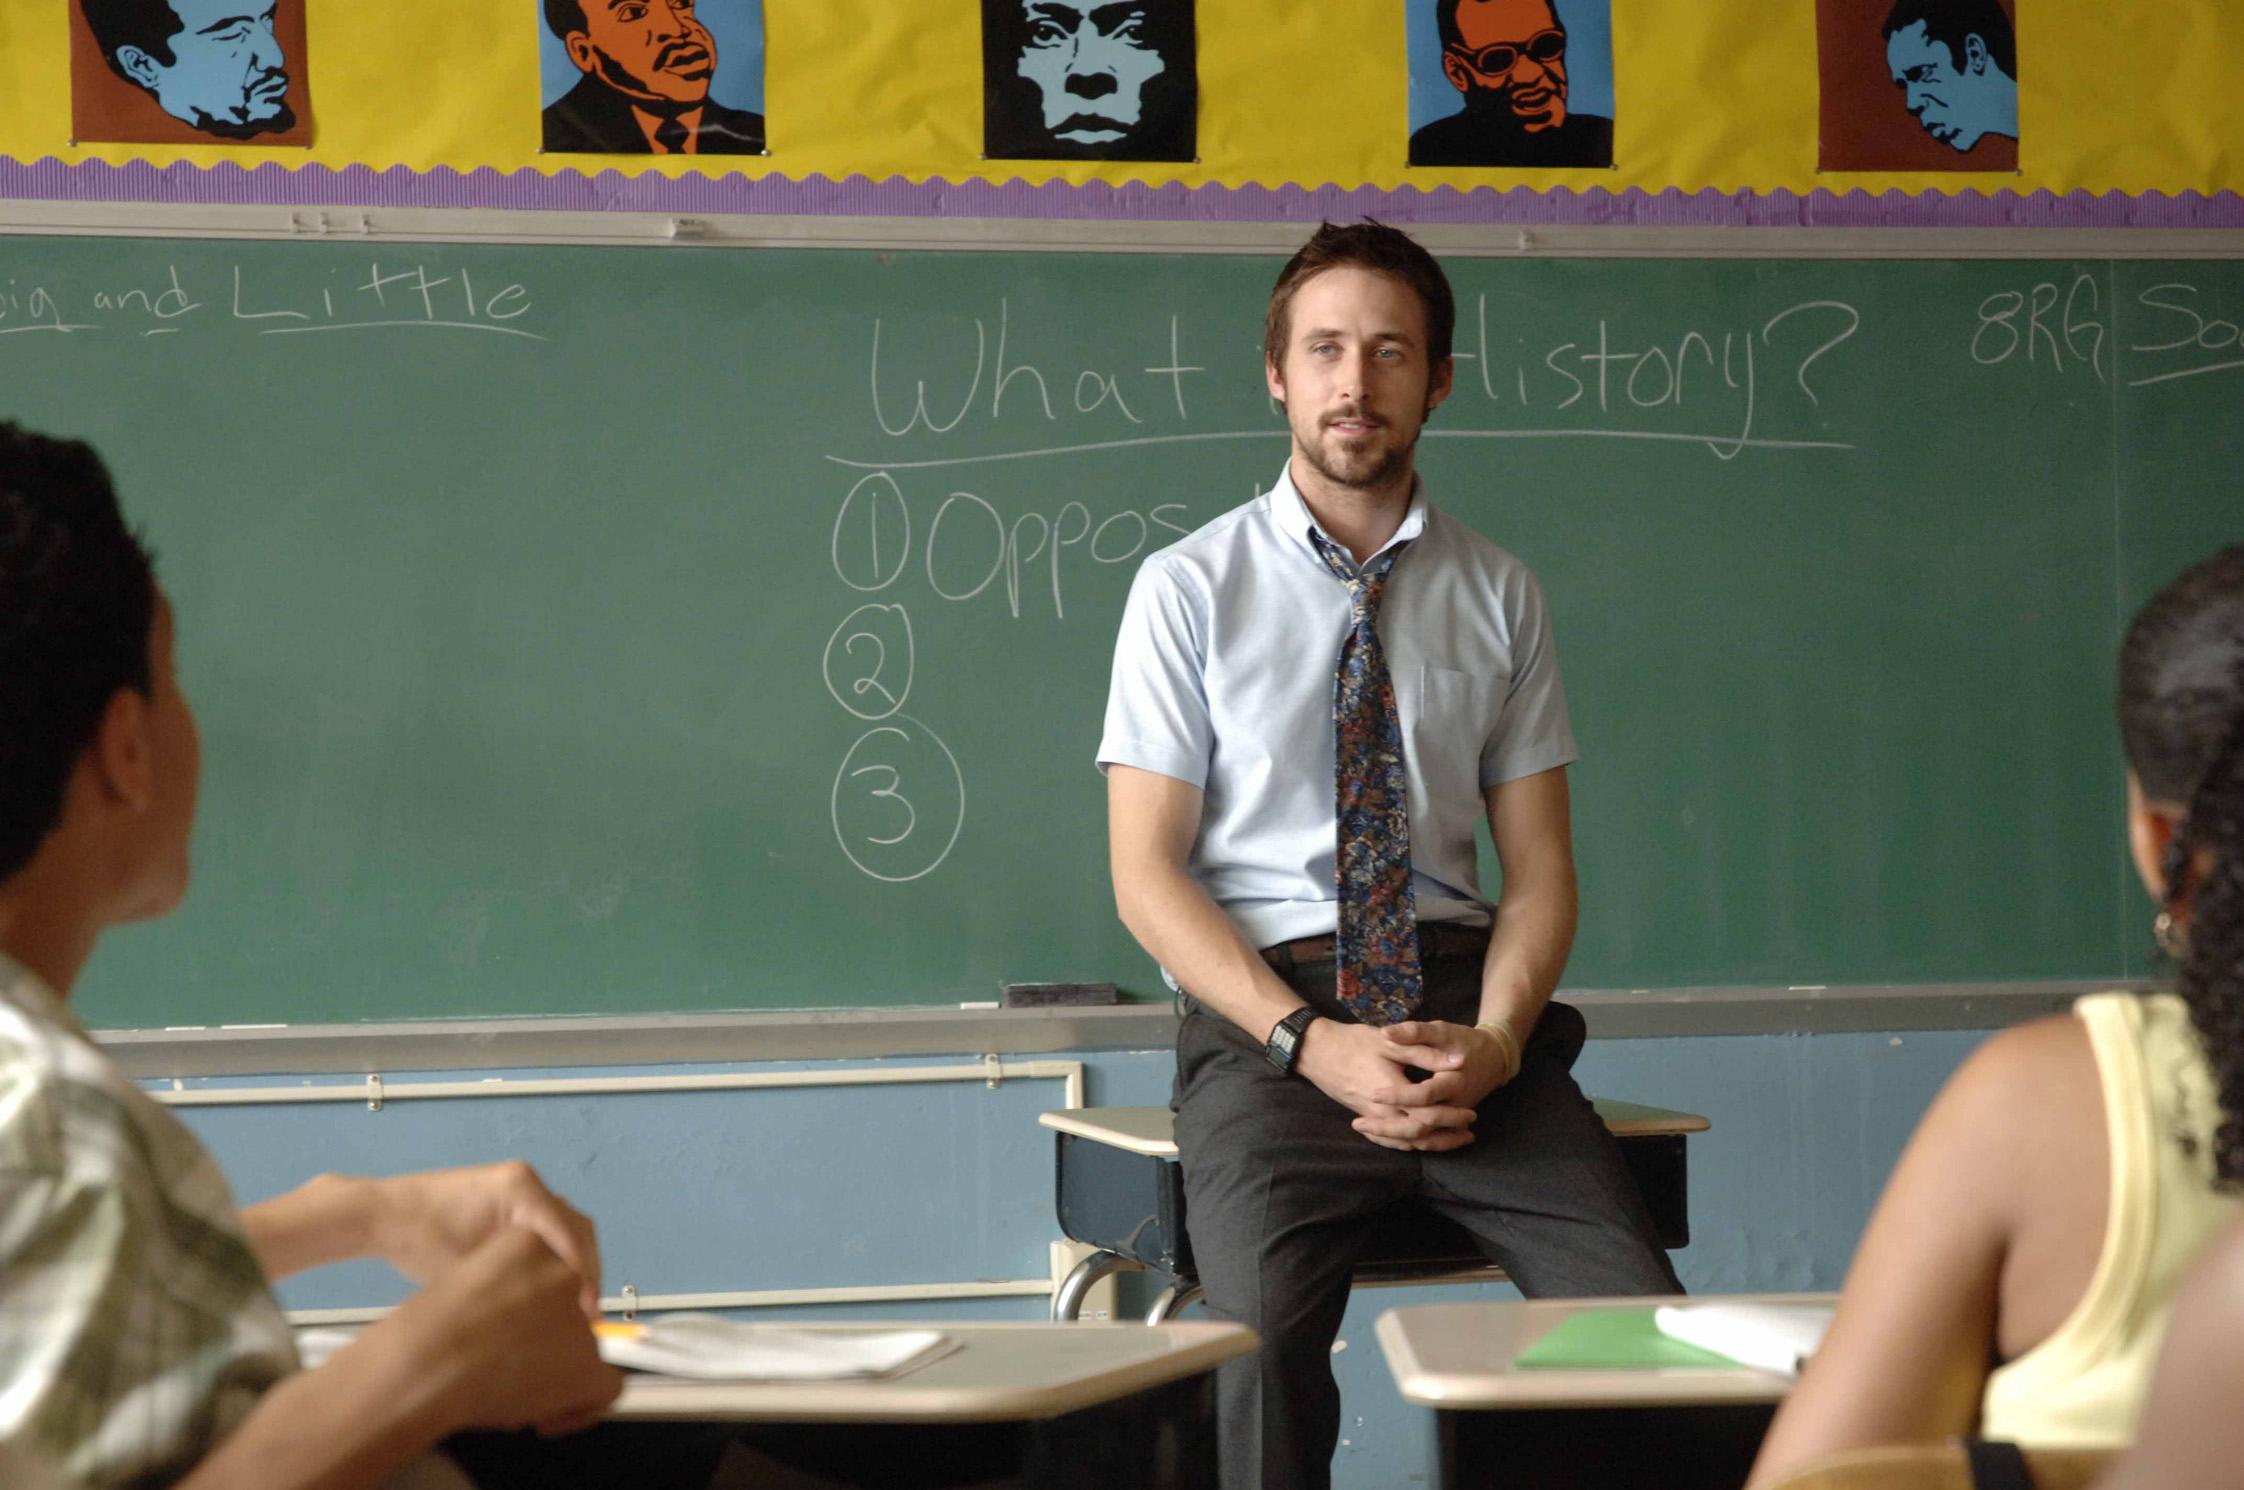 221-gosling1.jpg